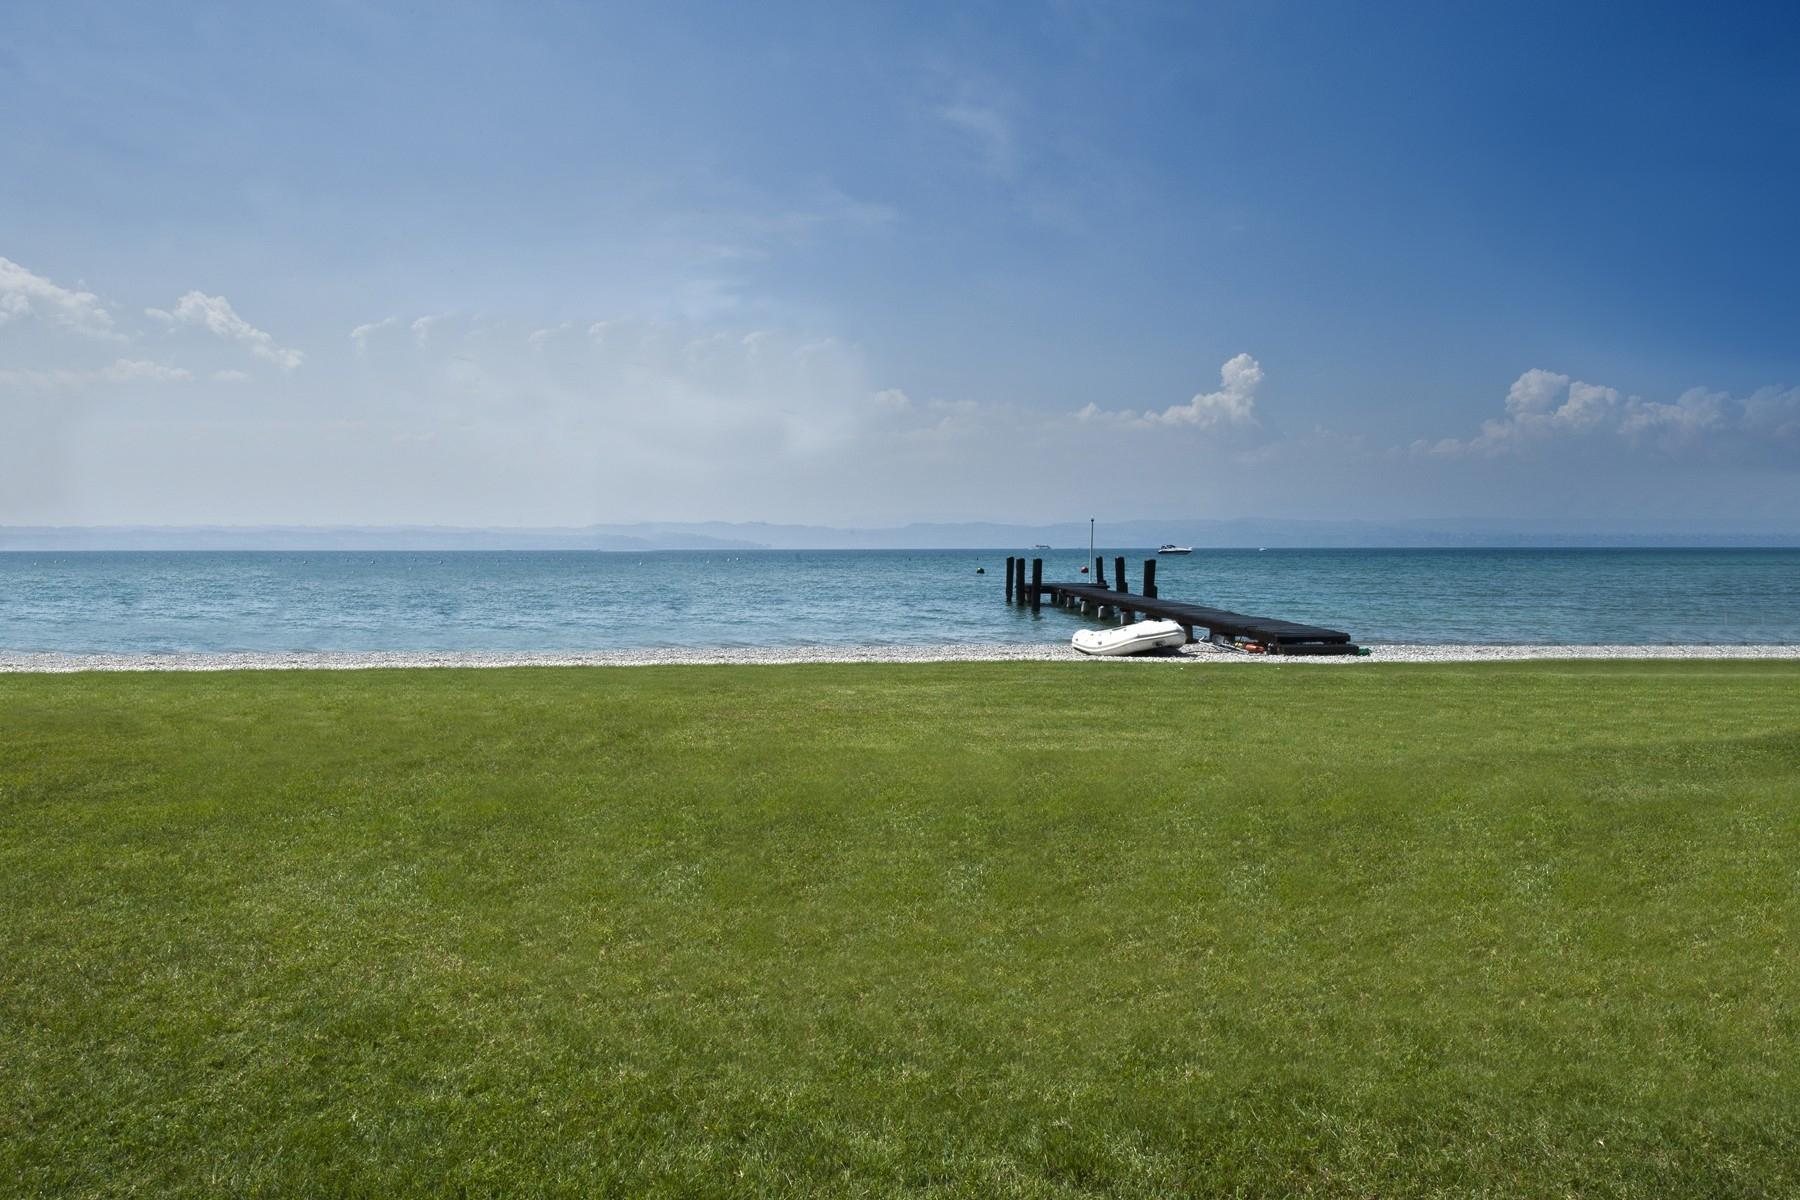 Villa unica pied dans l'eau con spiaggia e pontile a Sirmione - 2